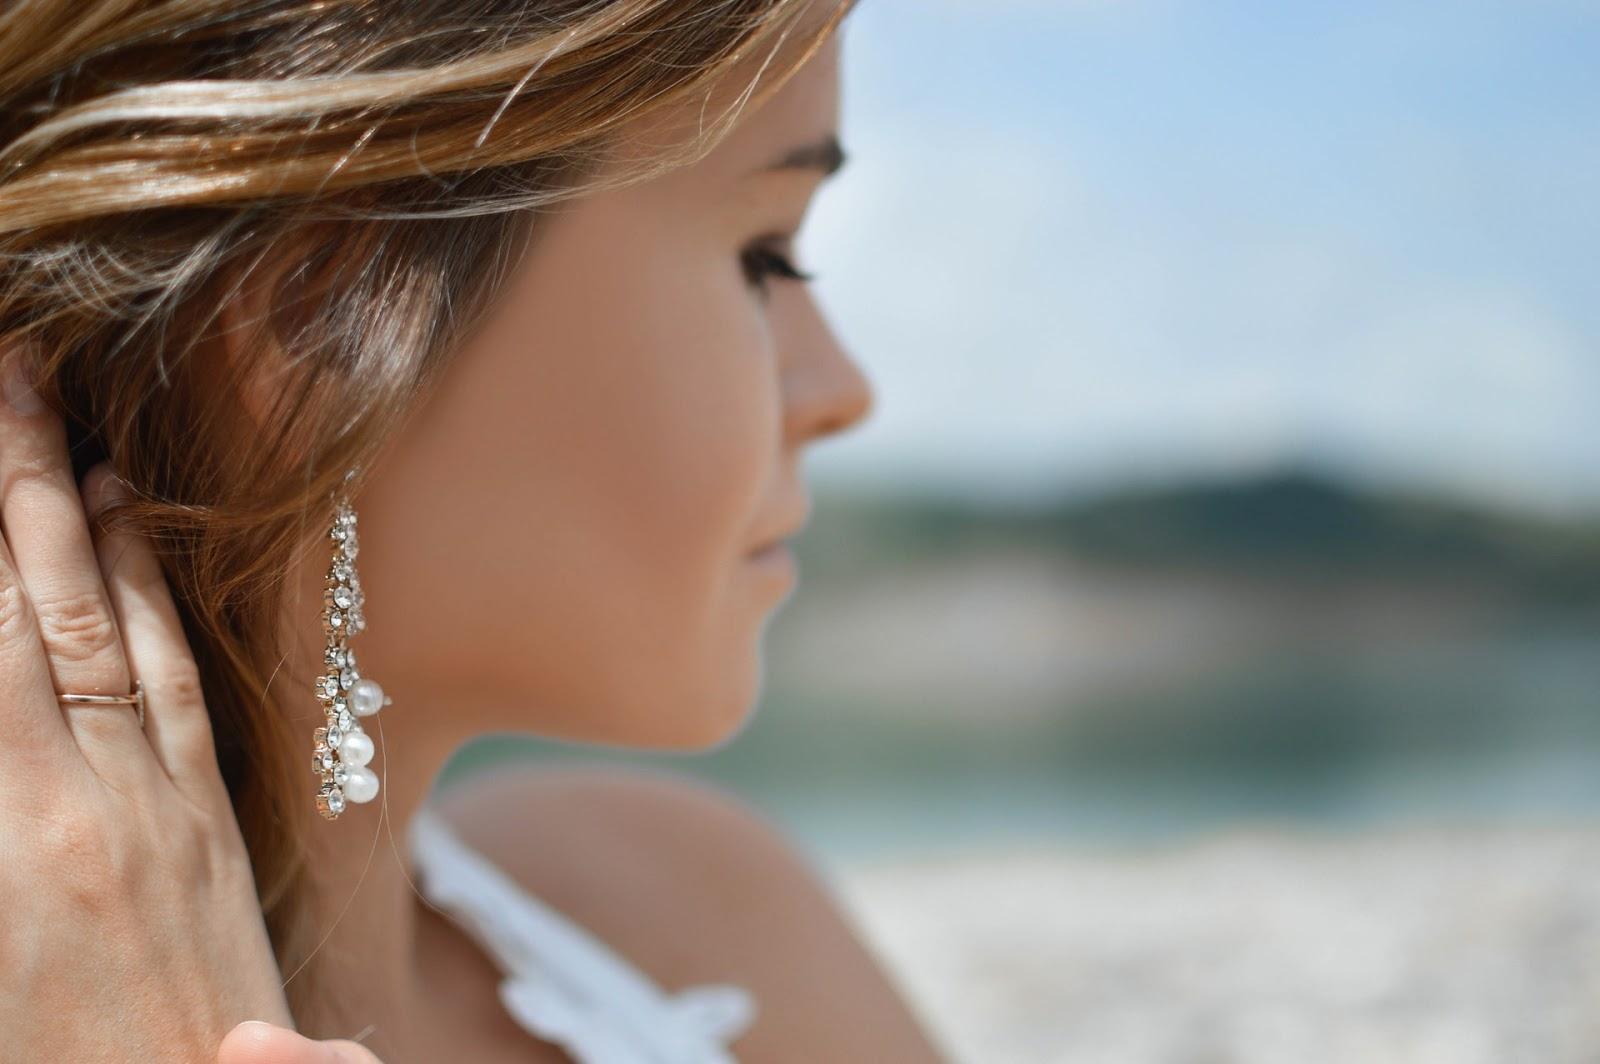 woman wearing single earring with pearls